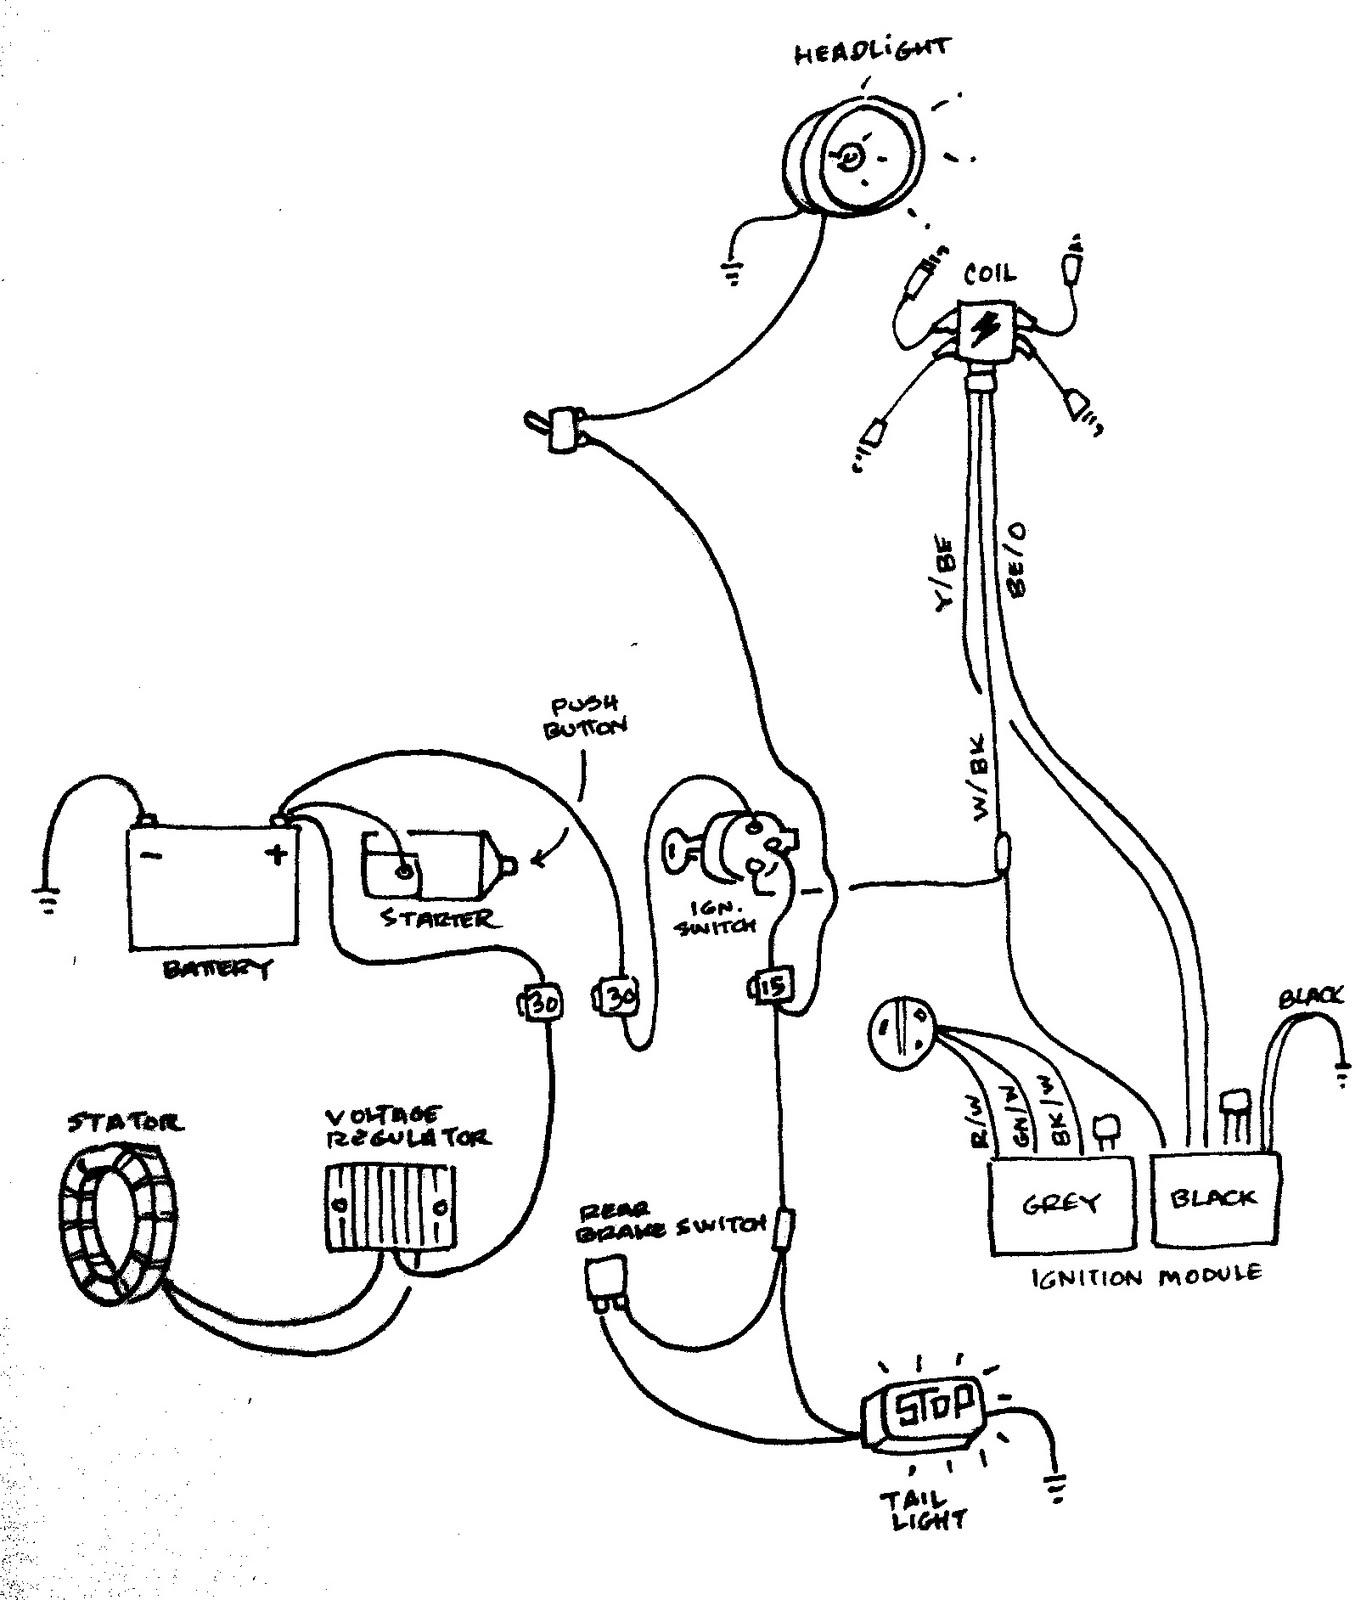 Motor Trike Wiring Diagram Online Schematics Bodine Electric Moreover Single Phase Diagrams Trikke Dorable Vw